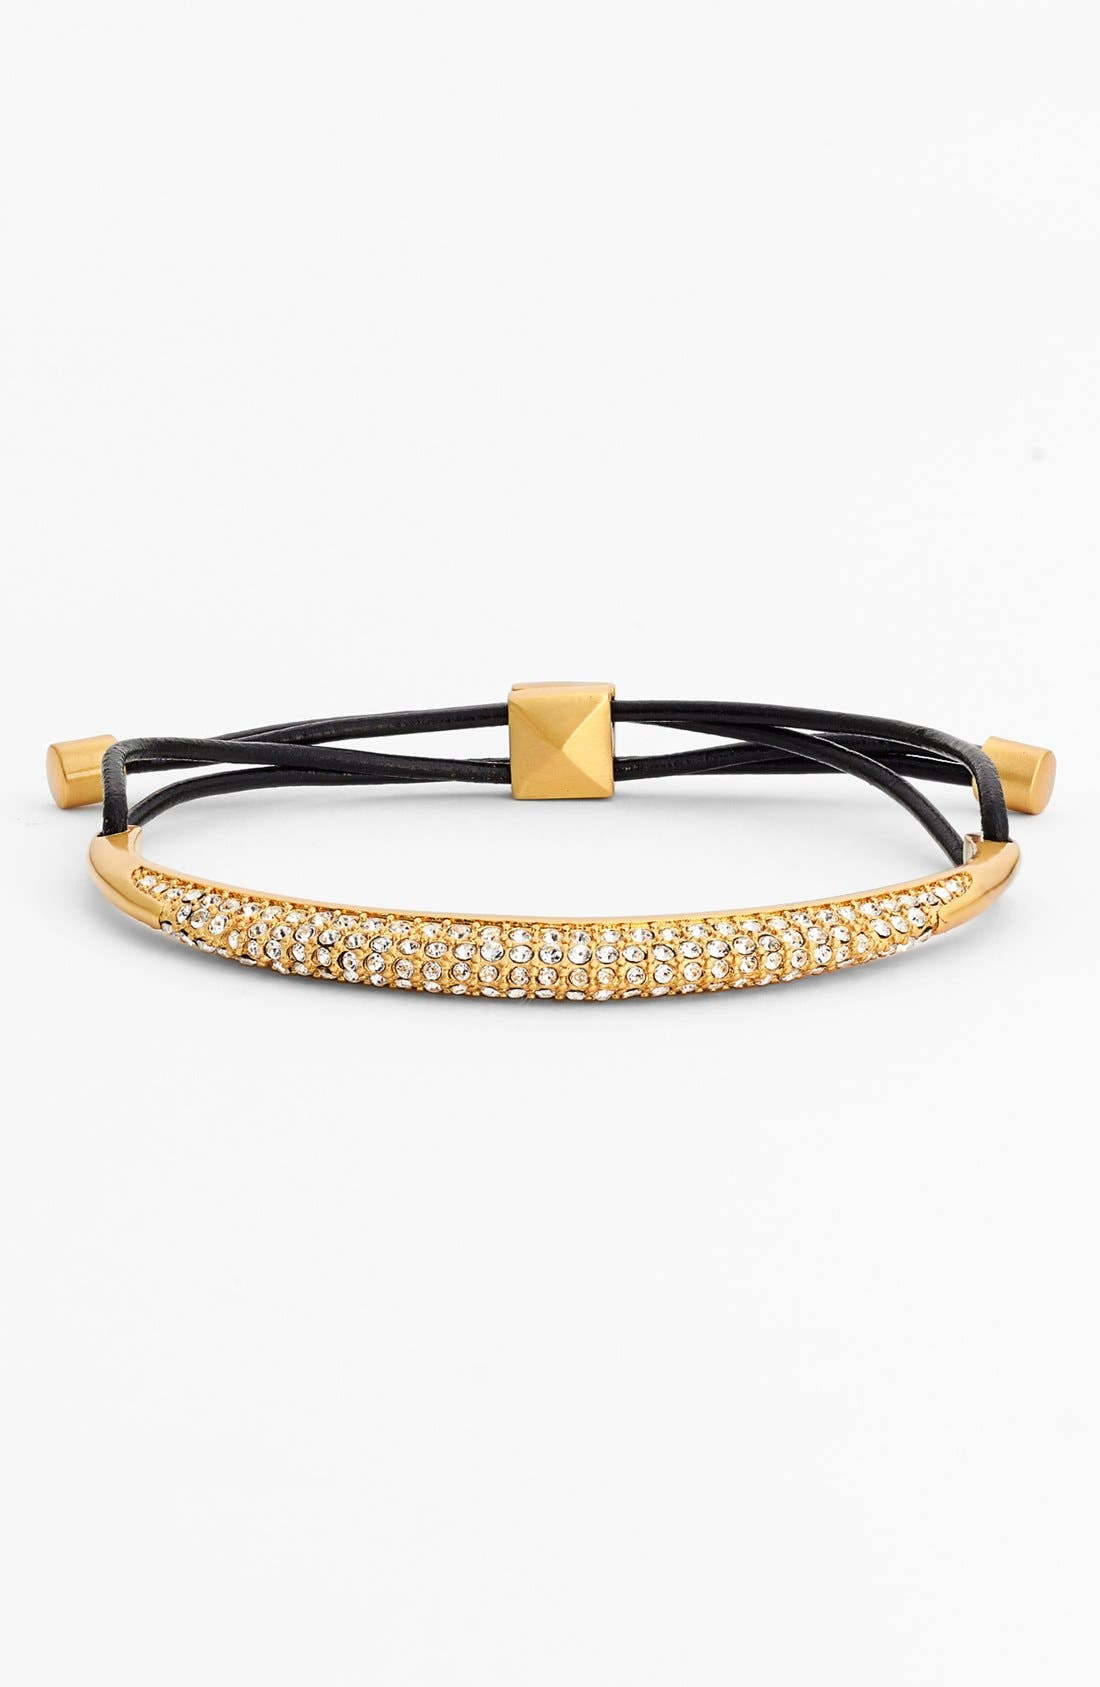 Main Image - Vince Camuto 'Caviar Dreams' Pavé Bracelet